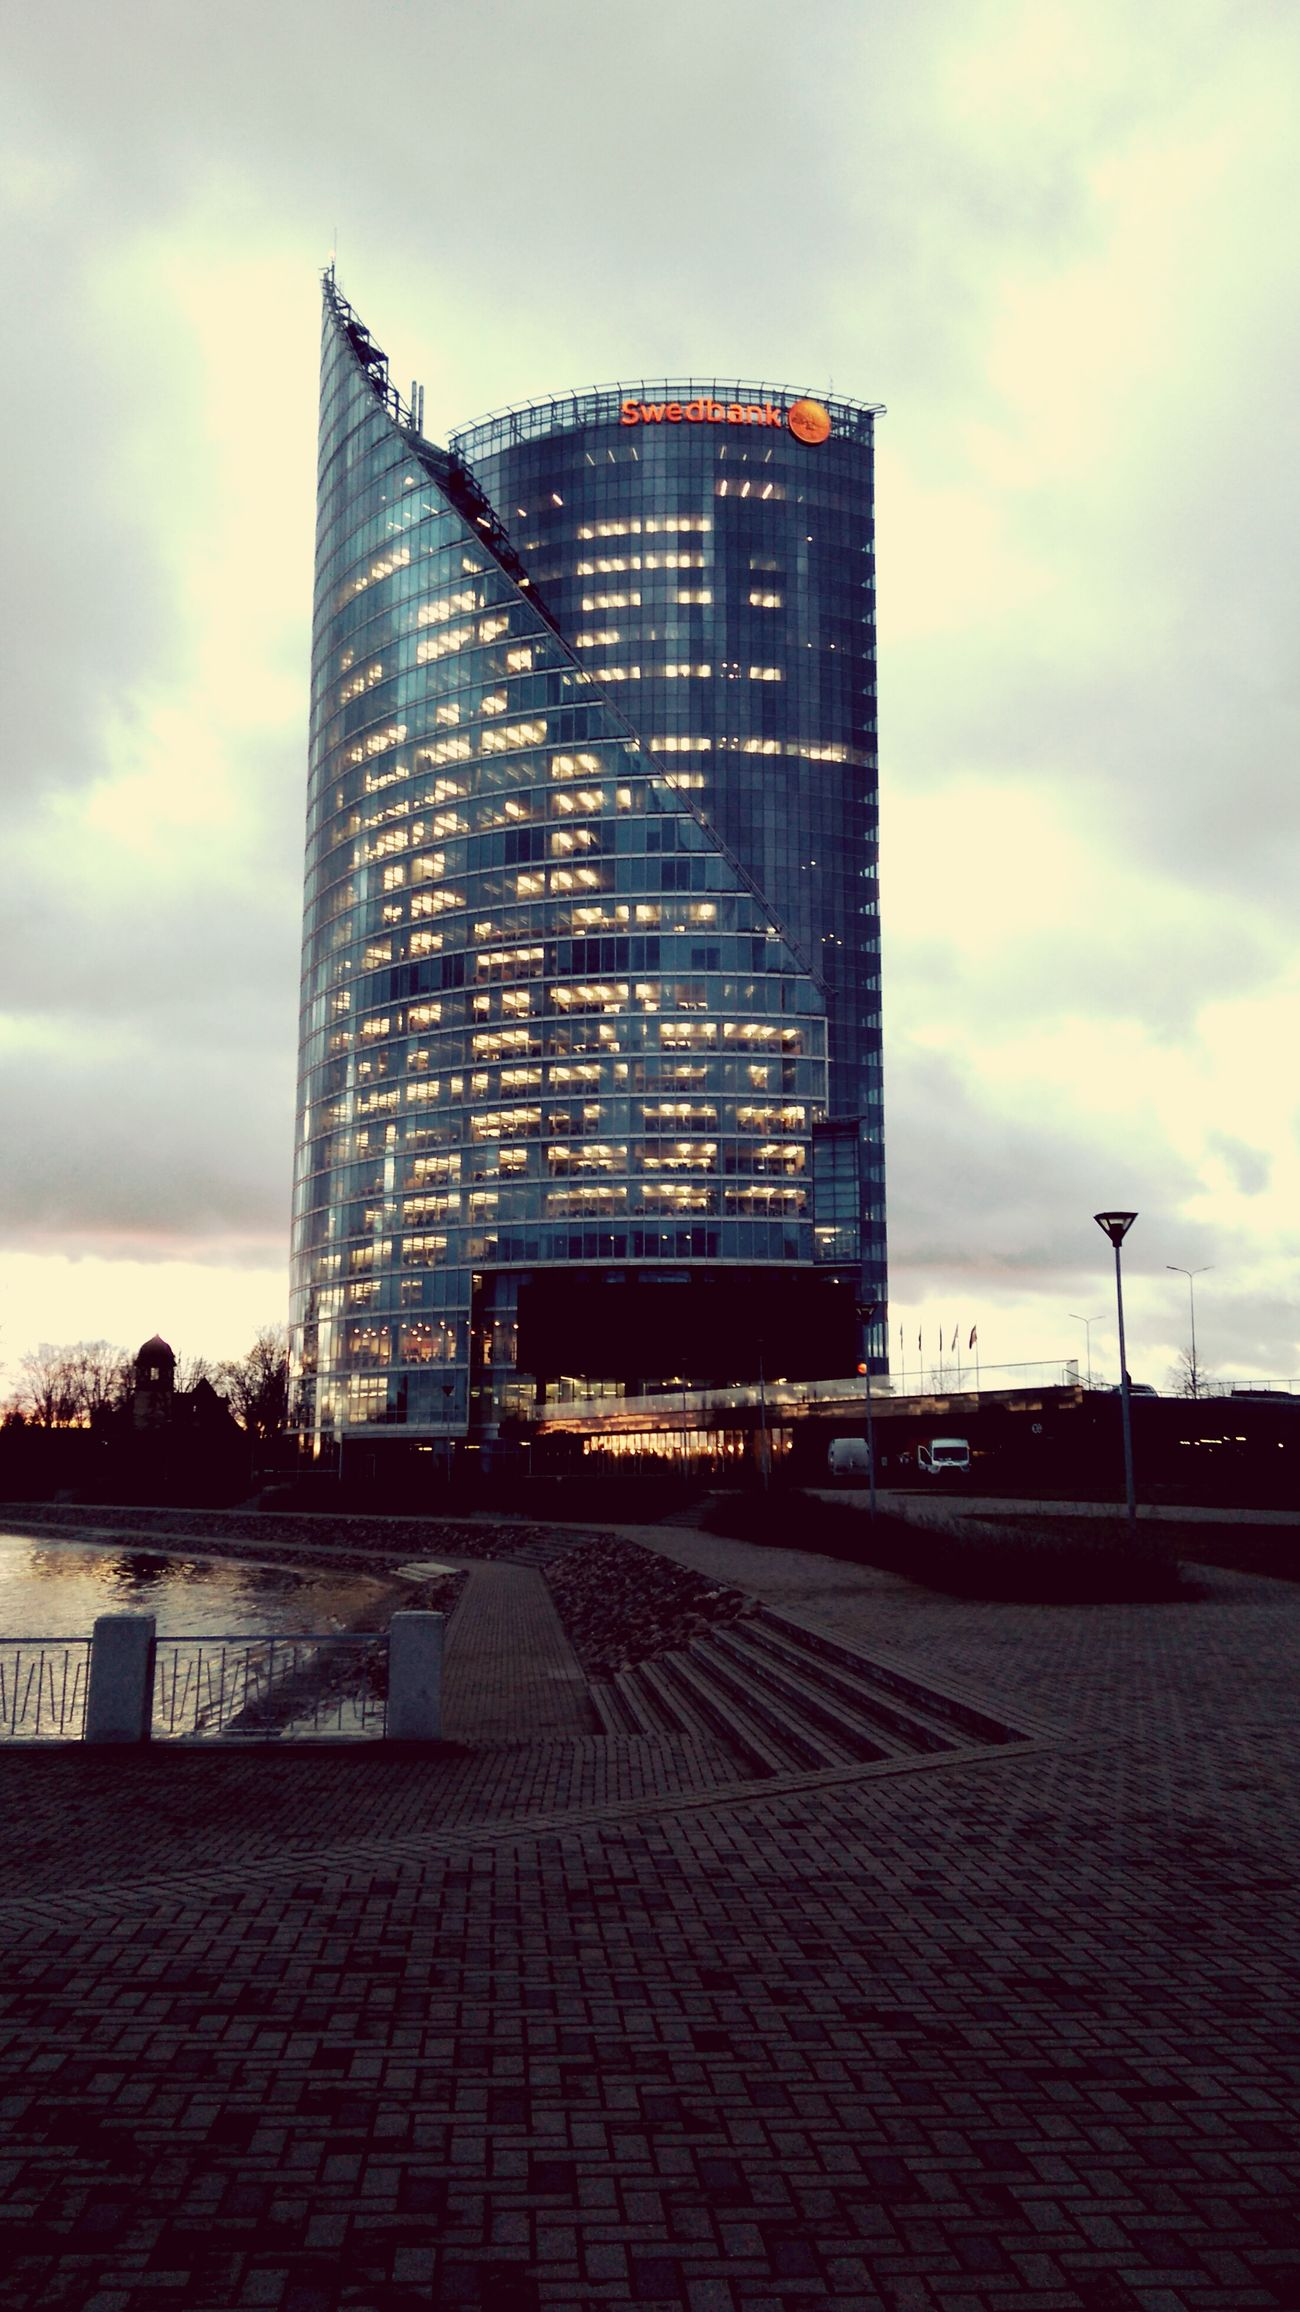 Taking Photos Simplicity Buildings Riga Swedbank